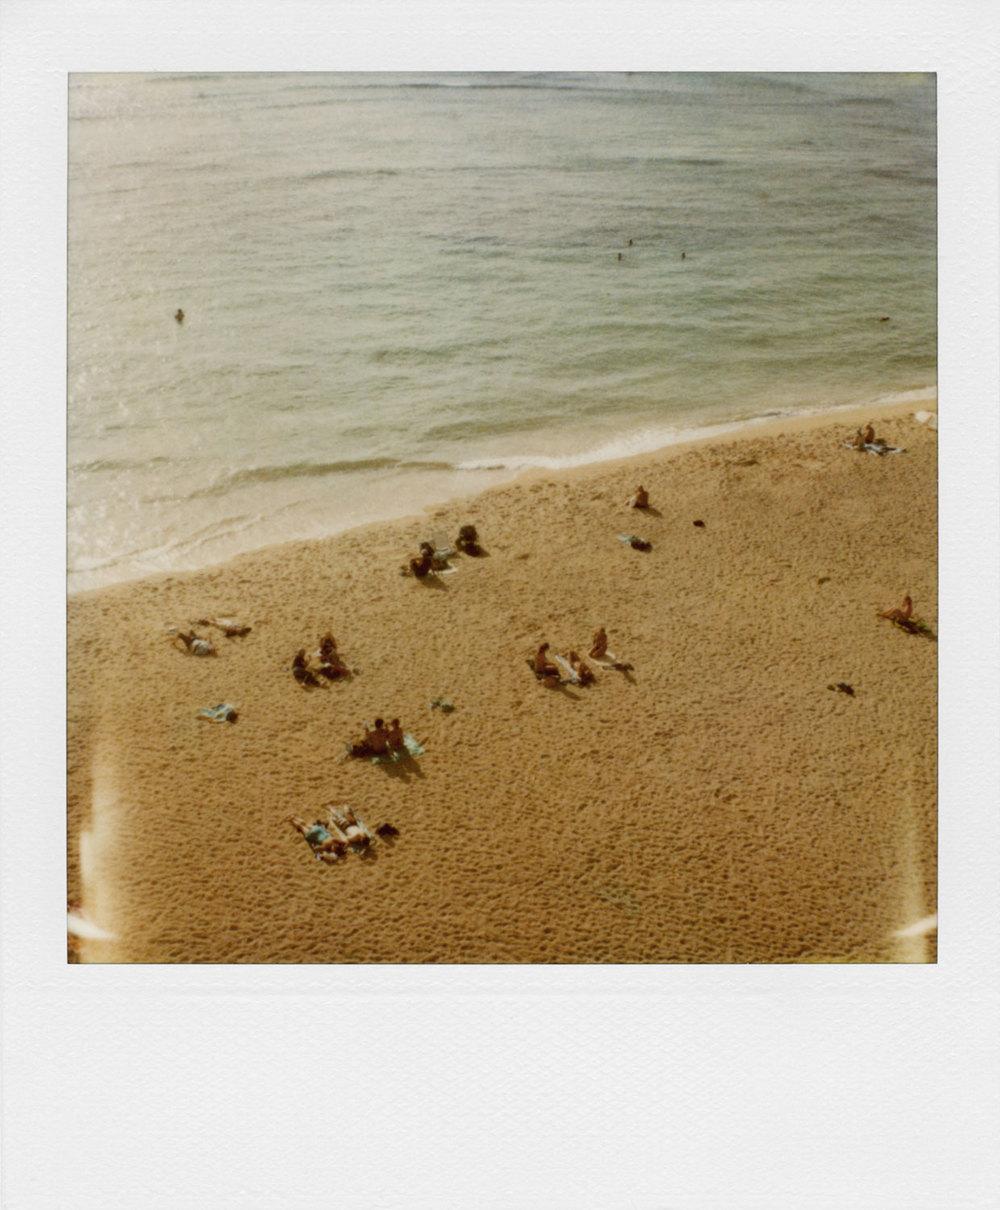 polaroid-38.jpg